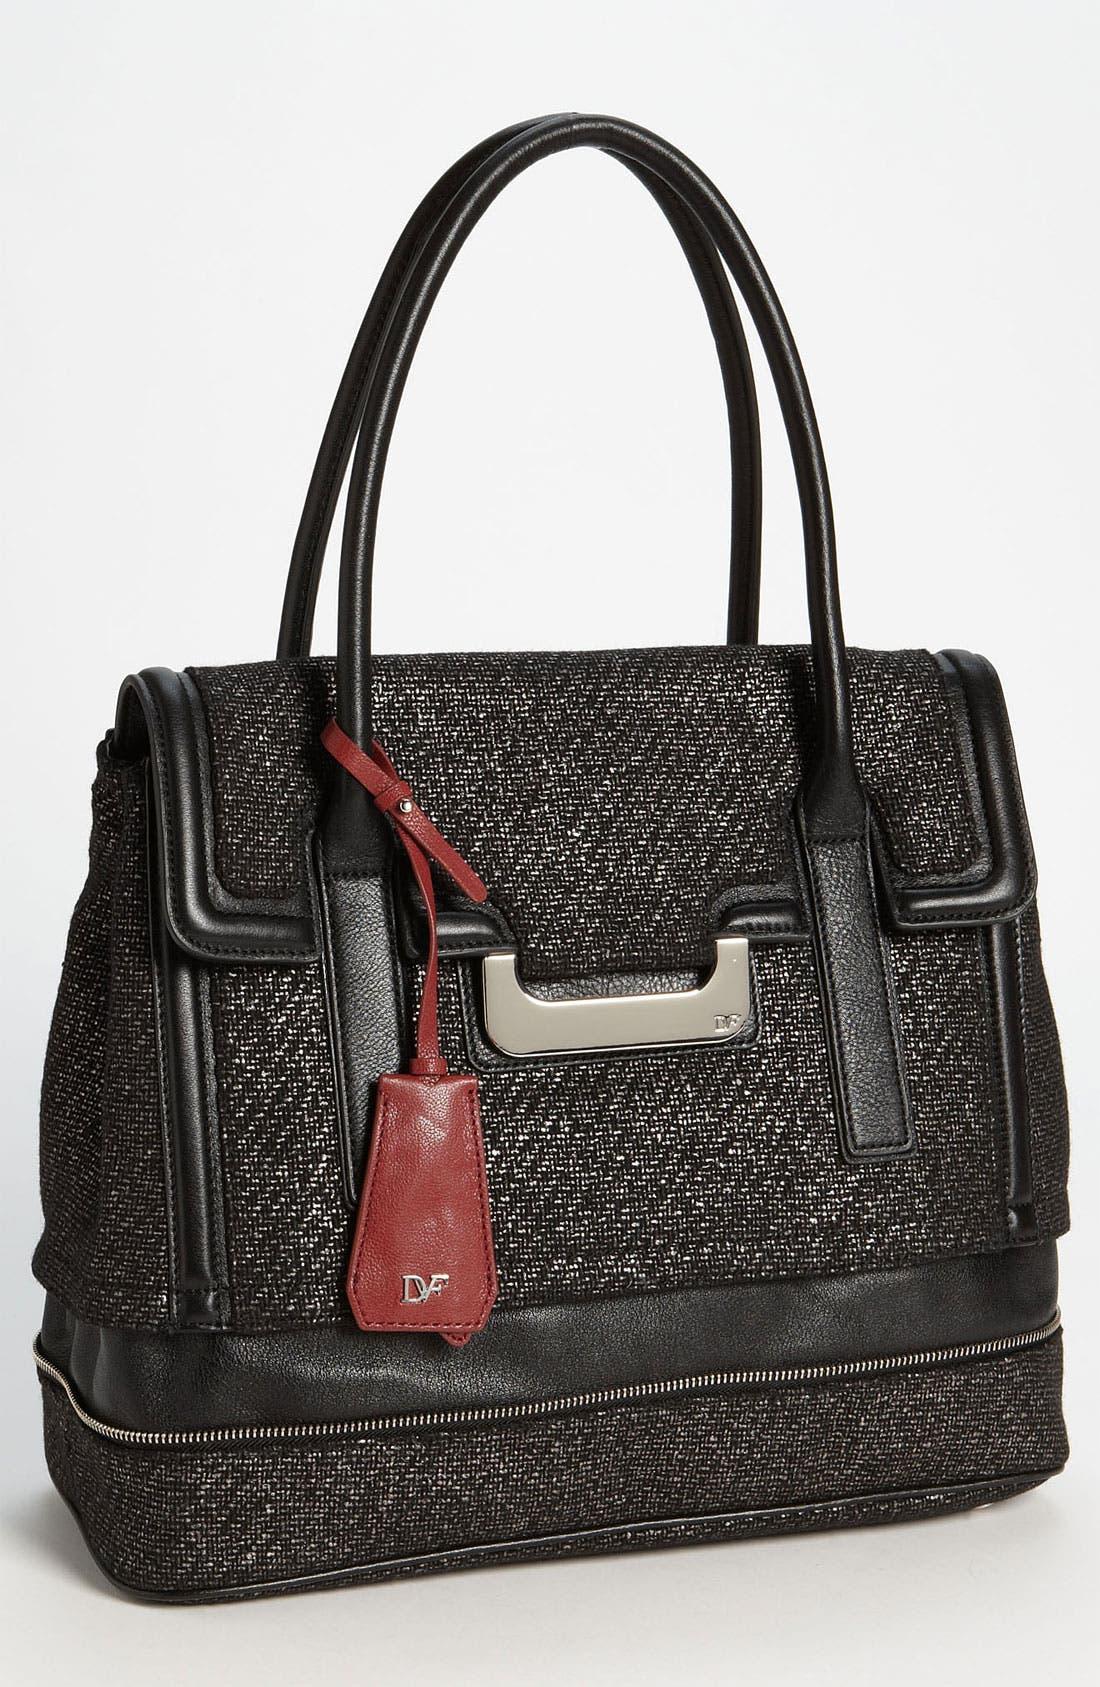 Main Image - Diane von Furstenberg 'New Harper - Laurel' Tweed Shoulder Bag